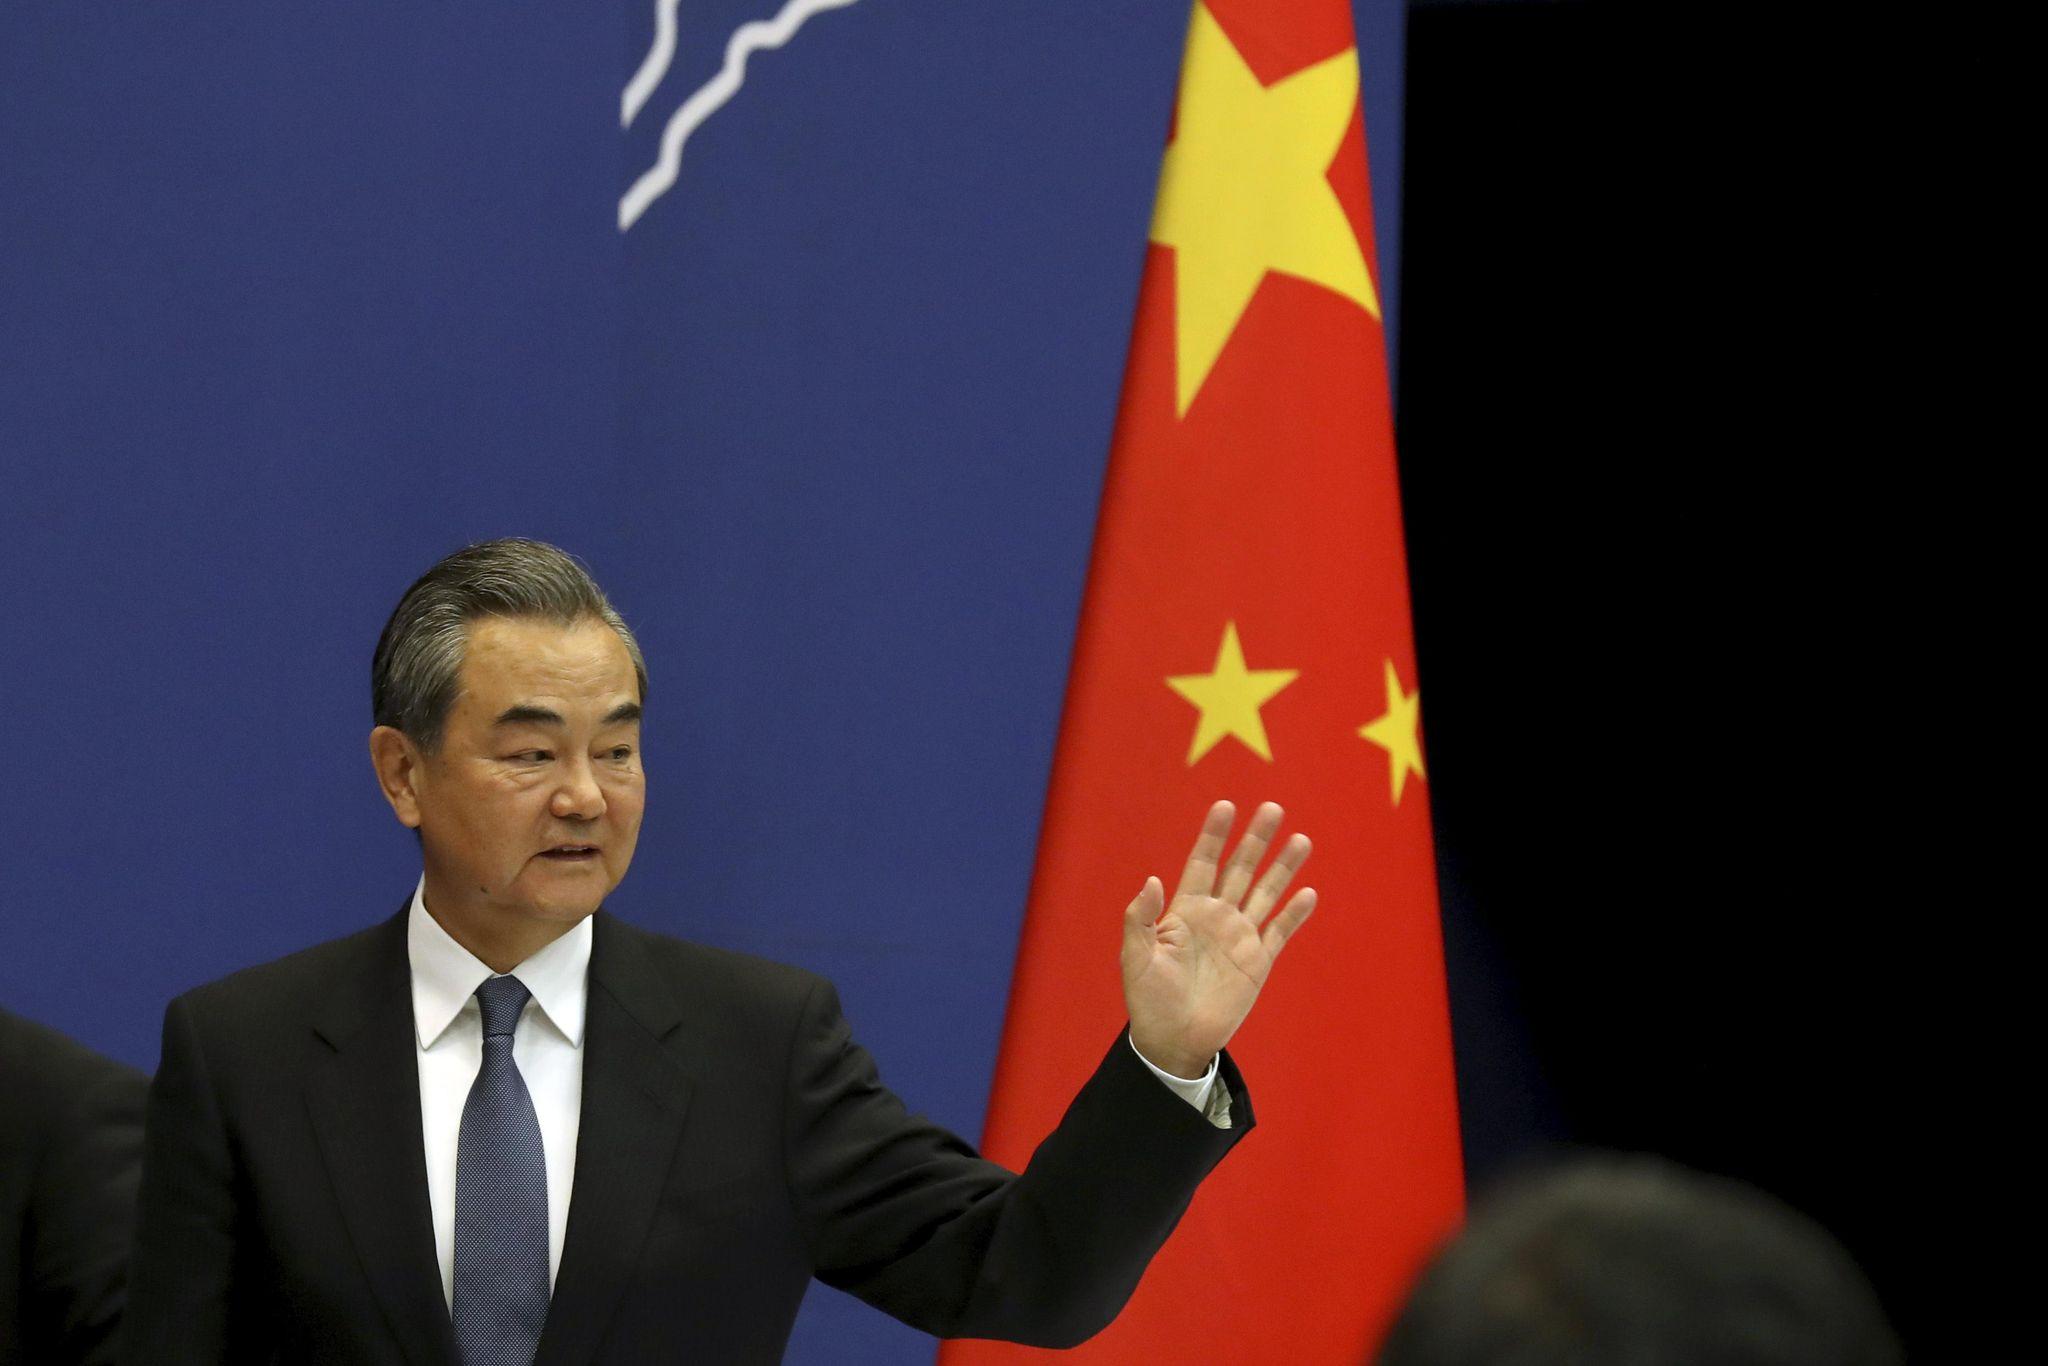 China downplays political impact of global development push